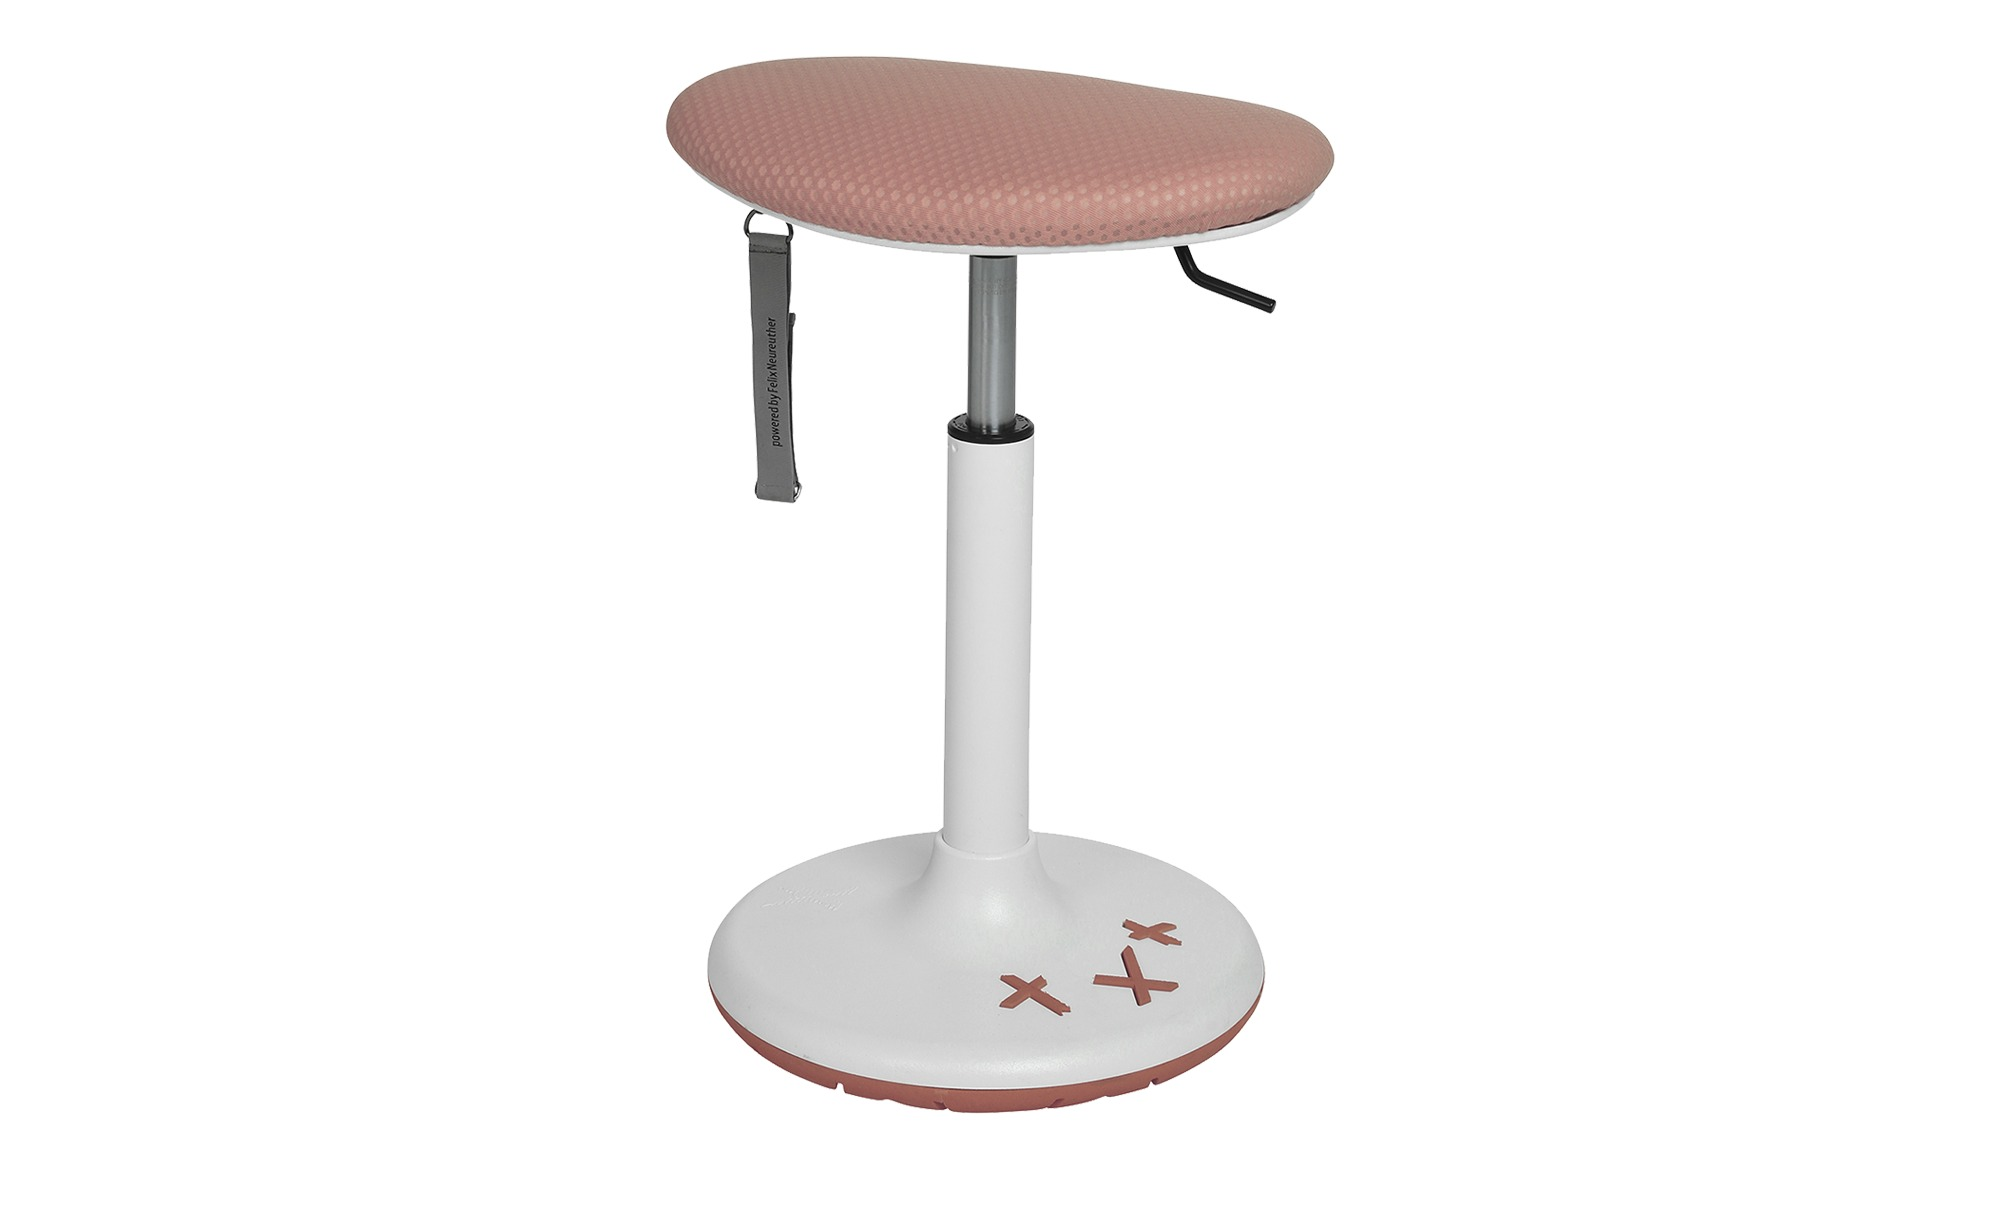 Sitness X Kinder-Drehhocker  Sitness X Stool 20 ¦ rosa/pink Stühle > Bürost günstig online kaufen